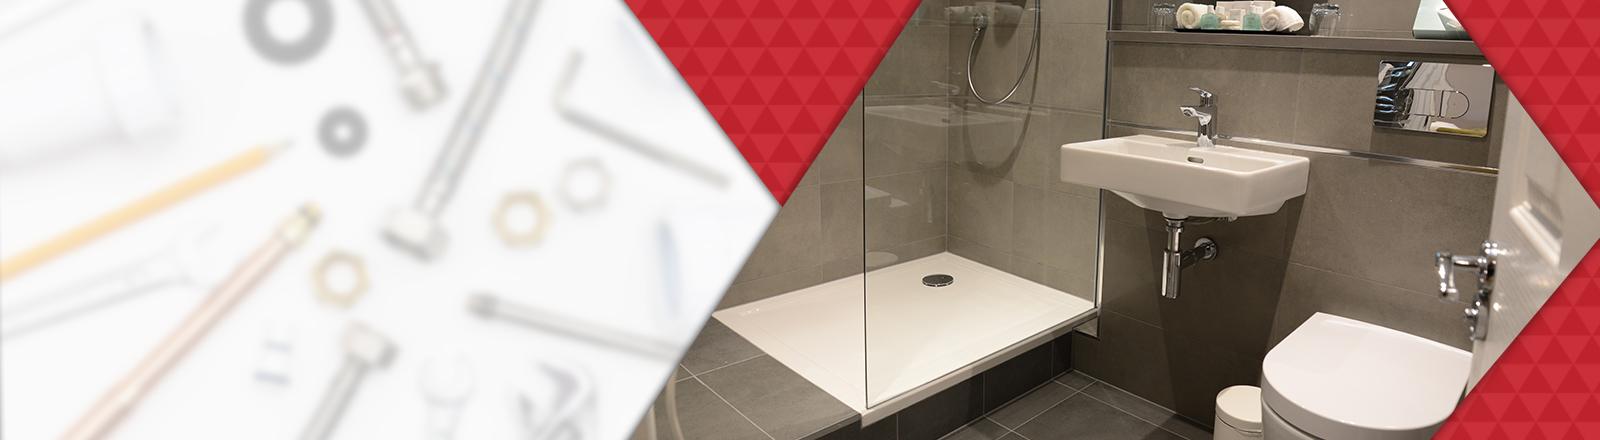 Bathroom Installation Service Kensington